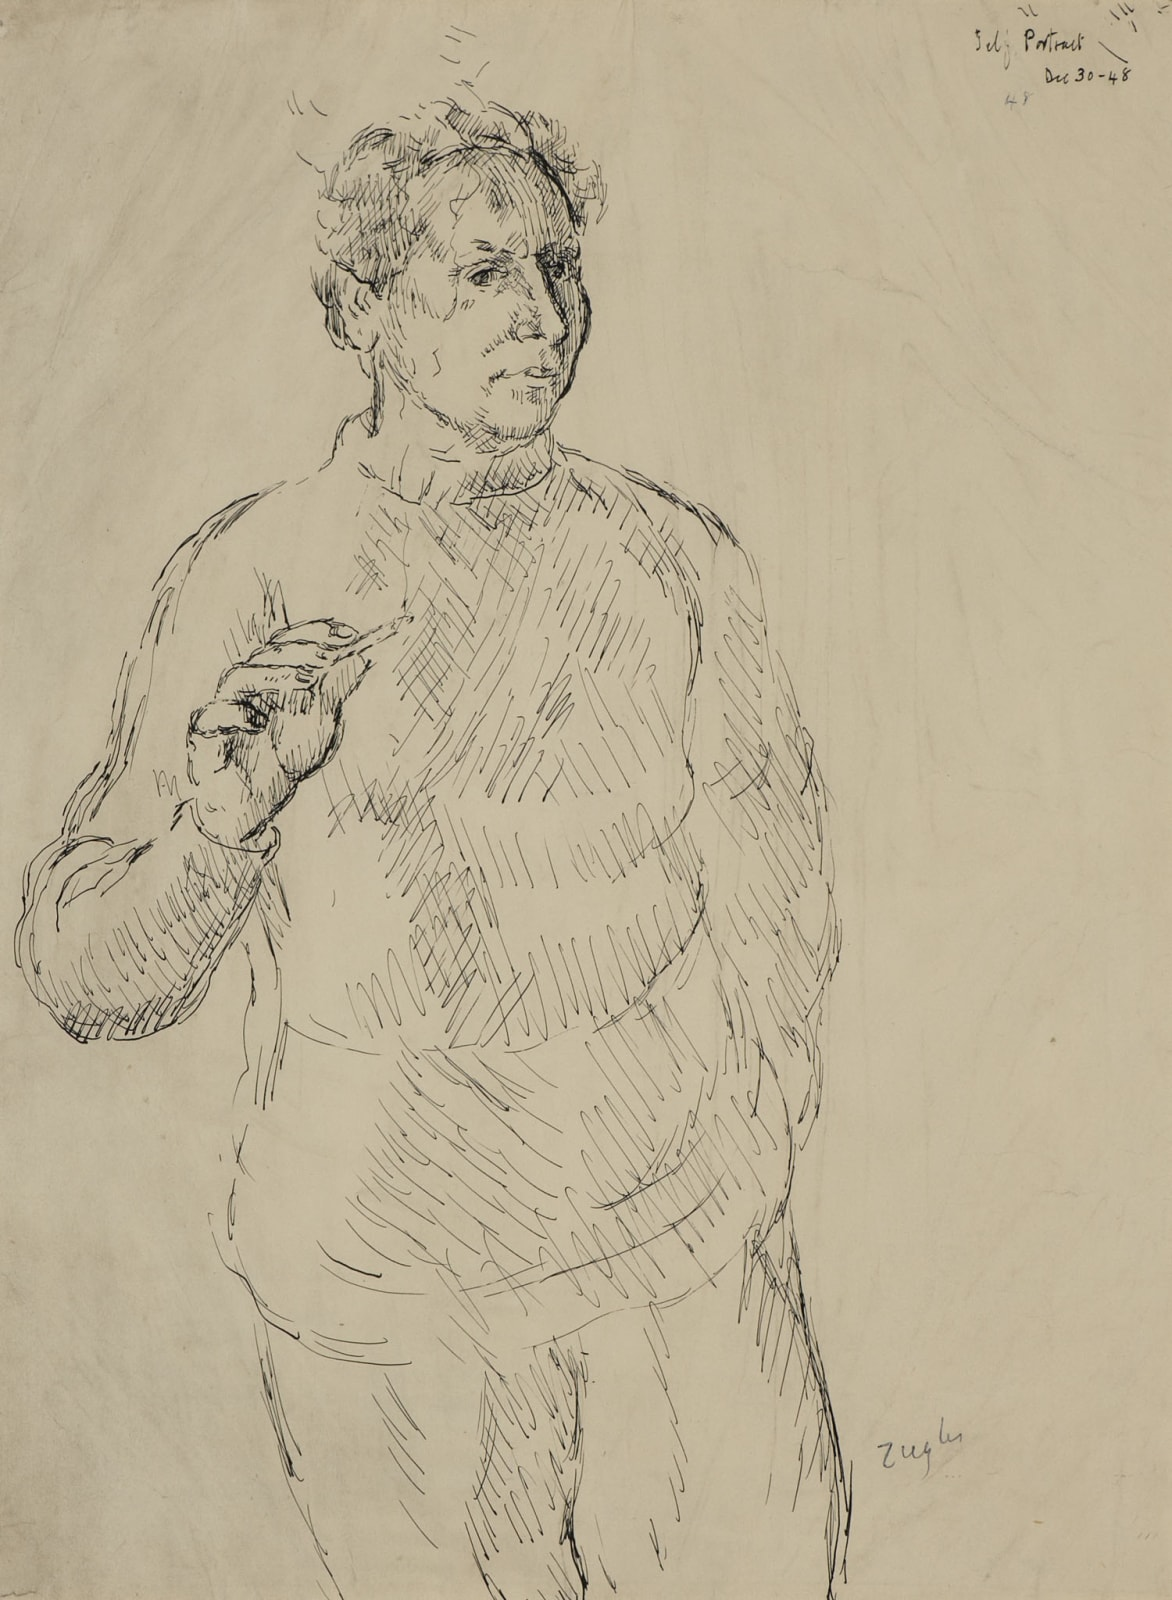 Archibald Ziegler (1903-1971) Self Portrait 1948 Pen and ink on paper 45.8 x 33.8 cm Ben Uri Collection © Archibald Ziegler estate